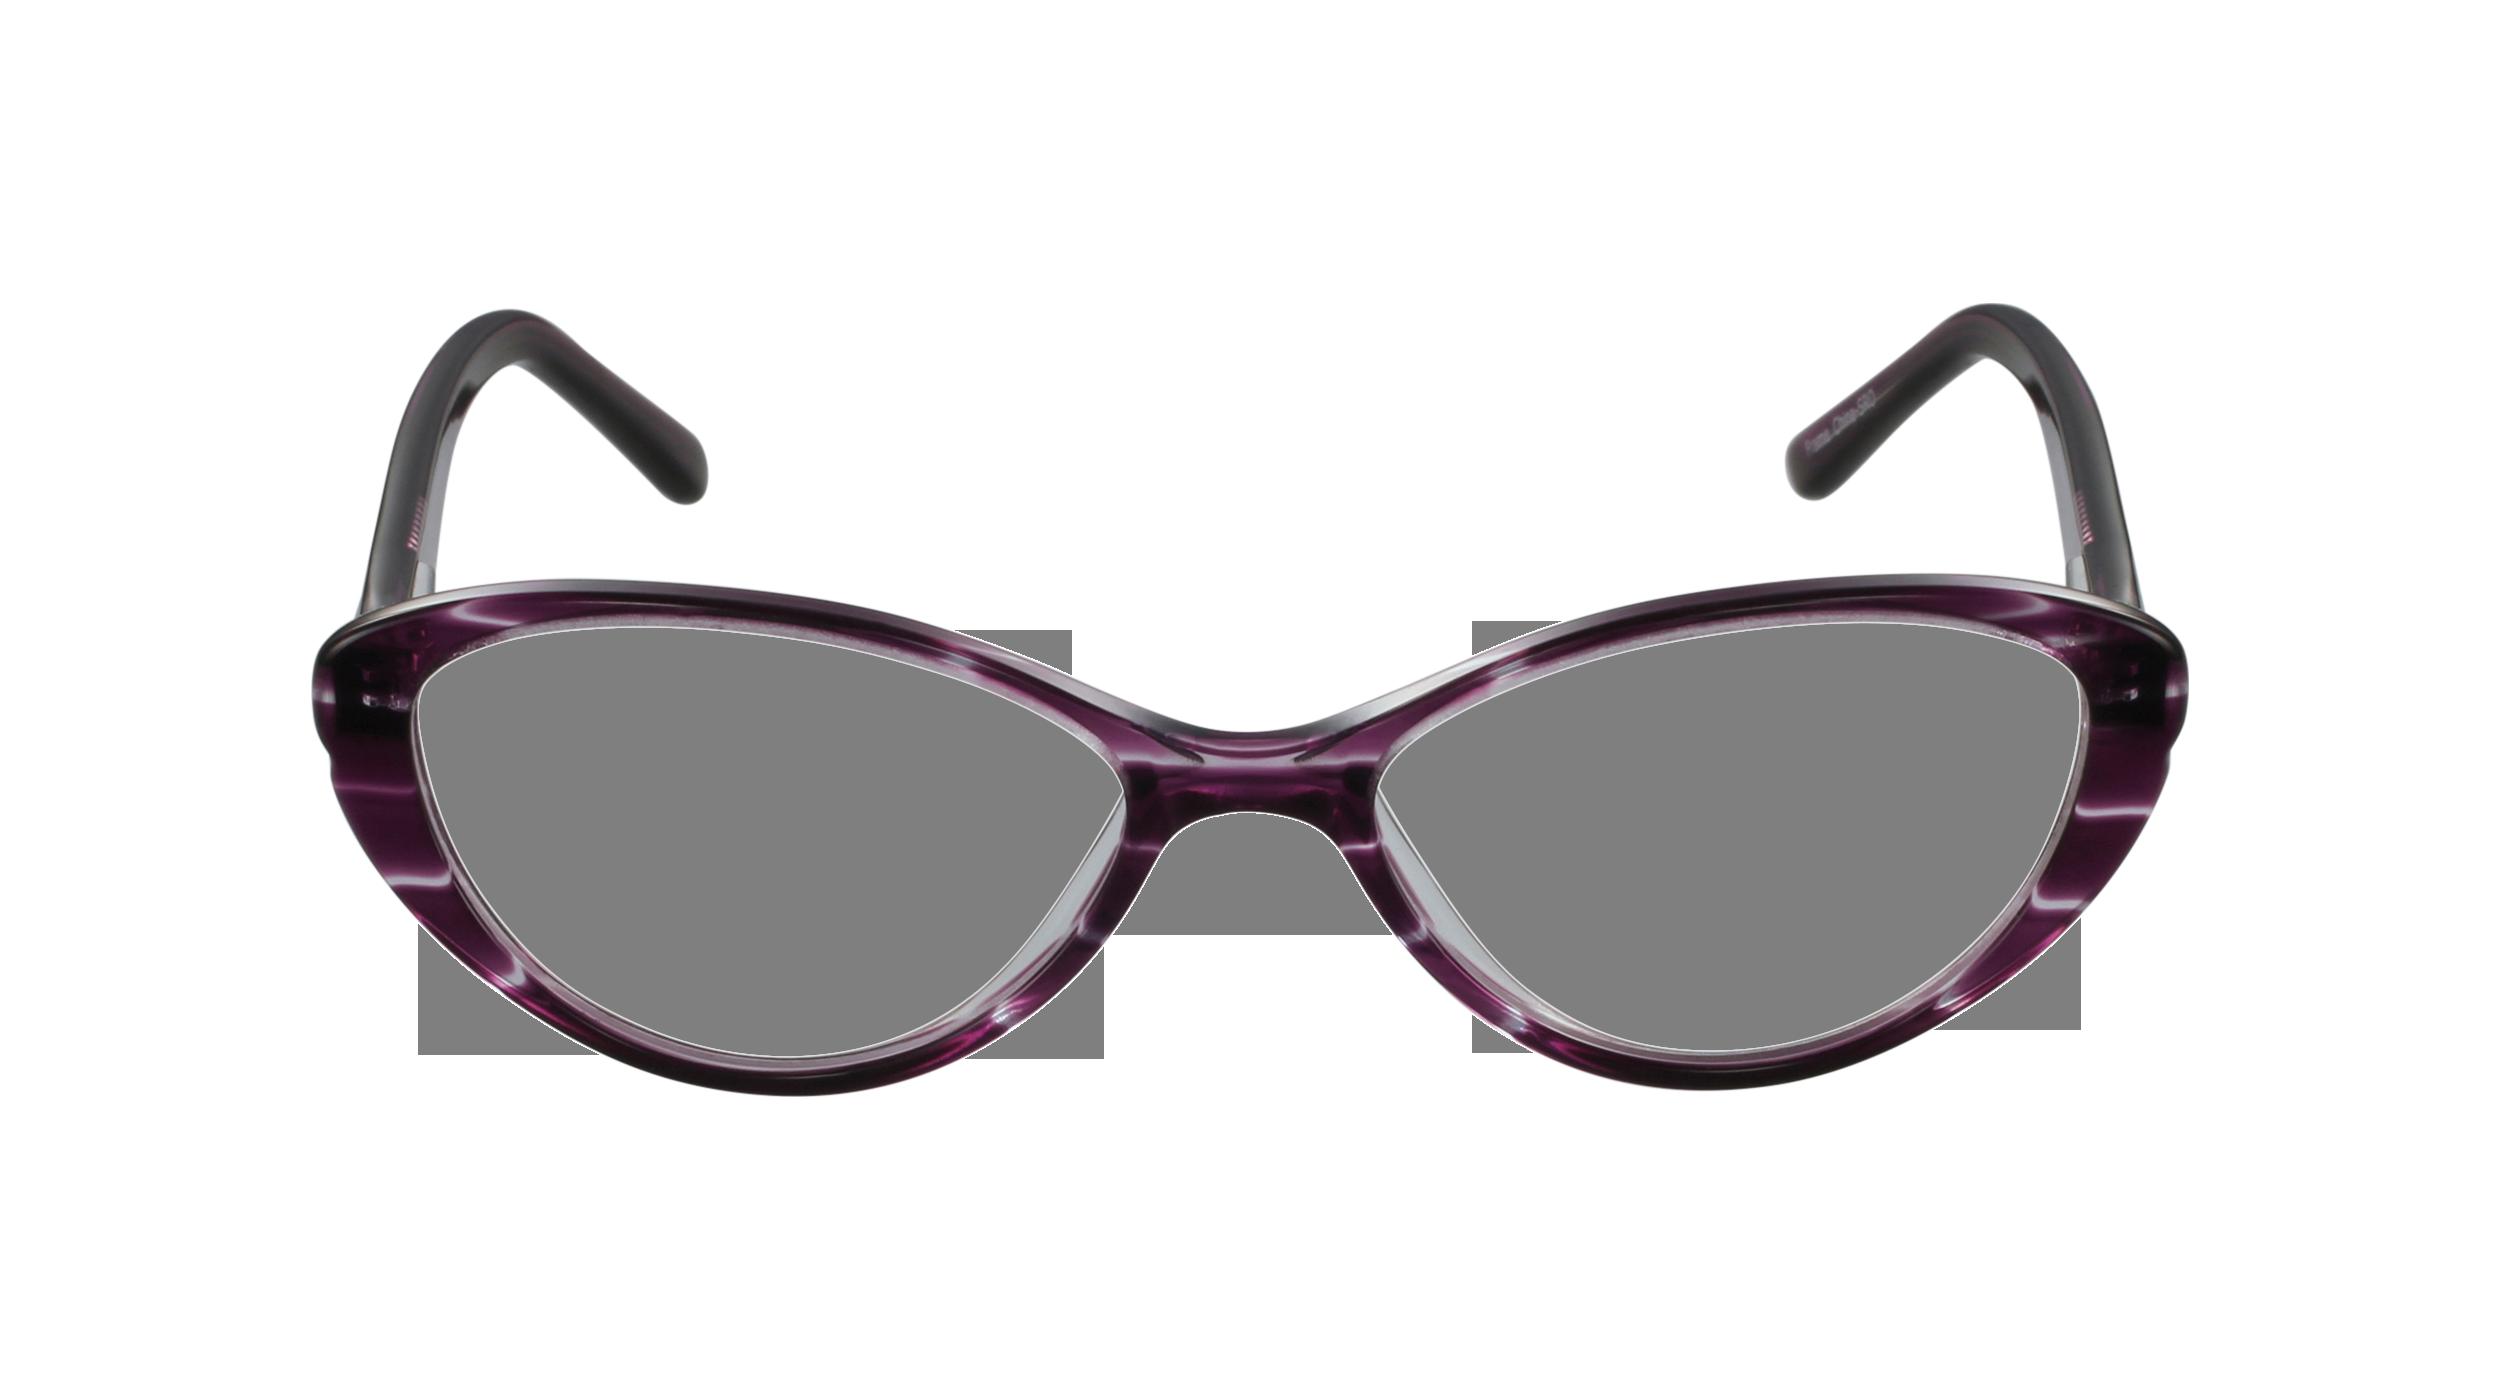 Jcpenney Optical For Eyewear Glasses Find Prescription Eyeglasses